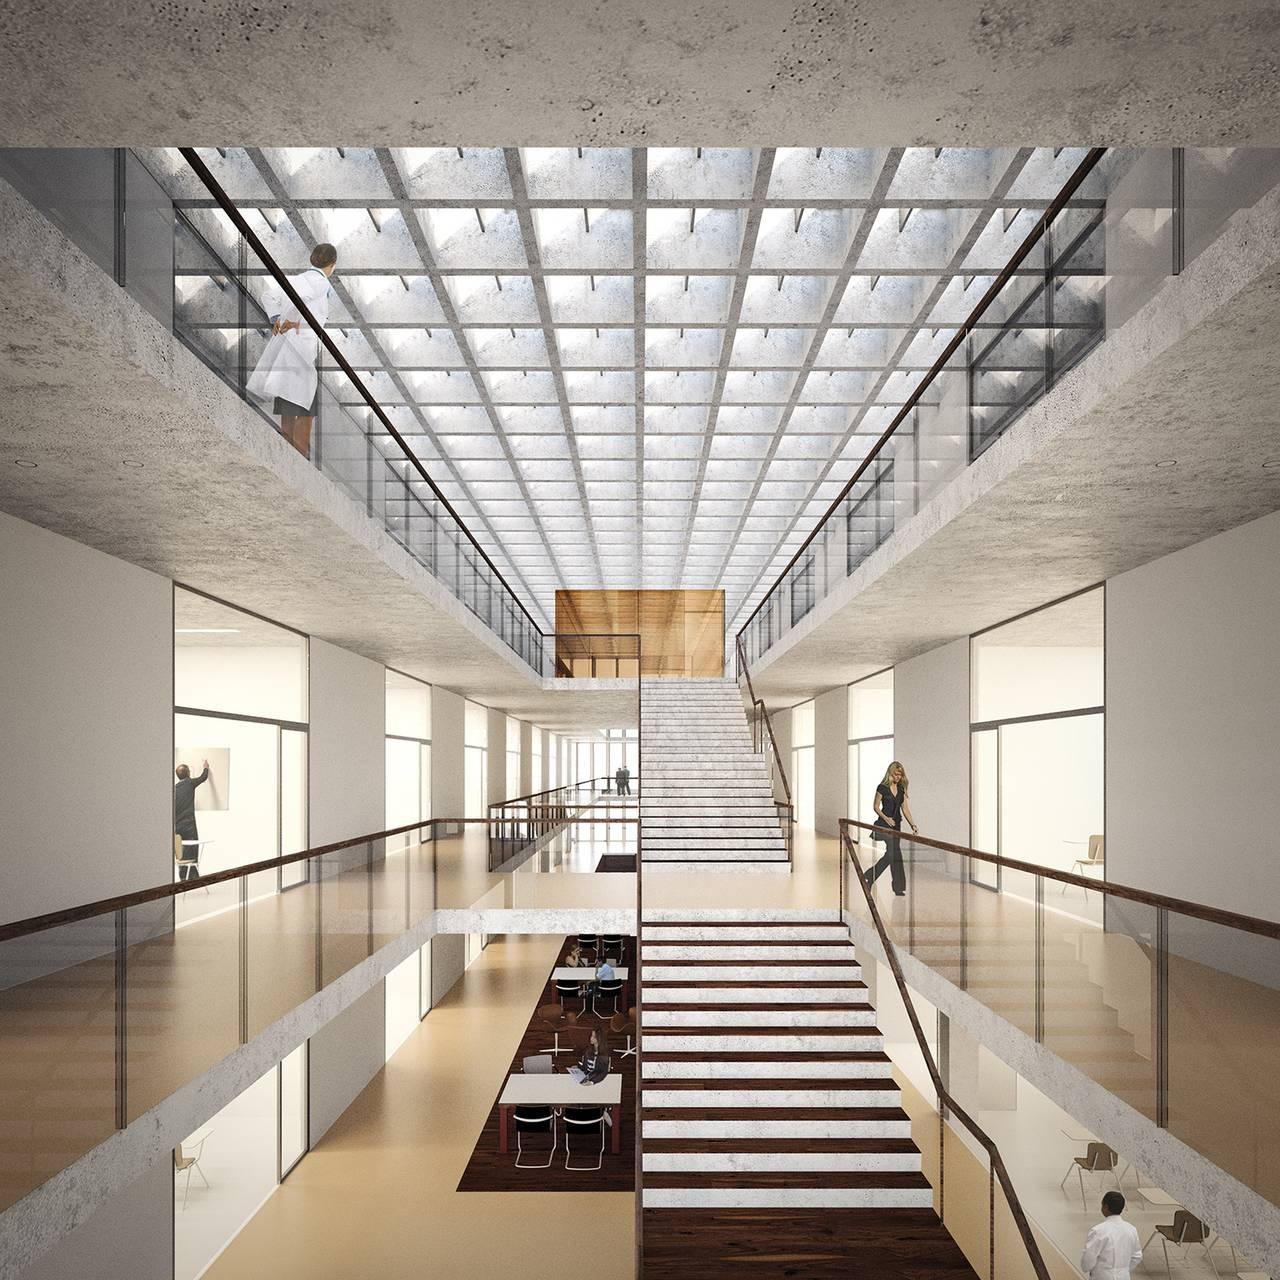 Facultad de Medicina de São José dos Campos diseñada por KAAN Architecten : Photo © Kaan Architecten